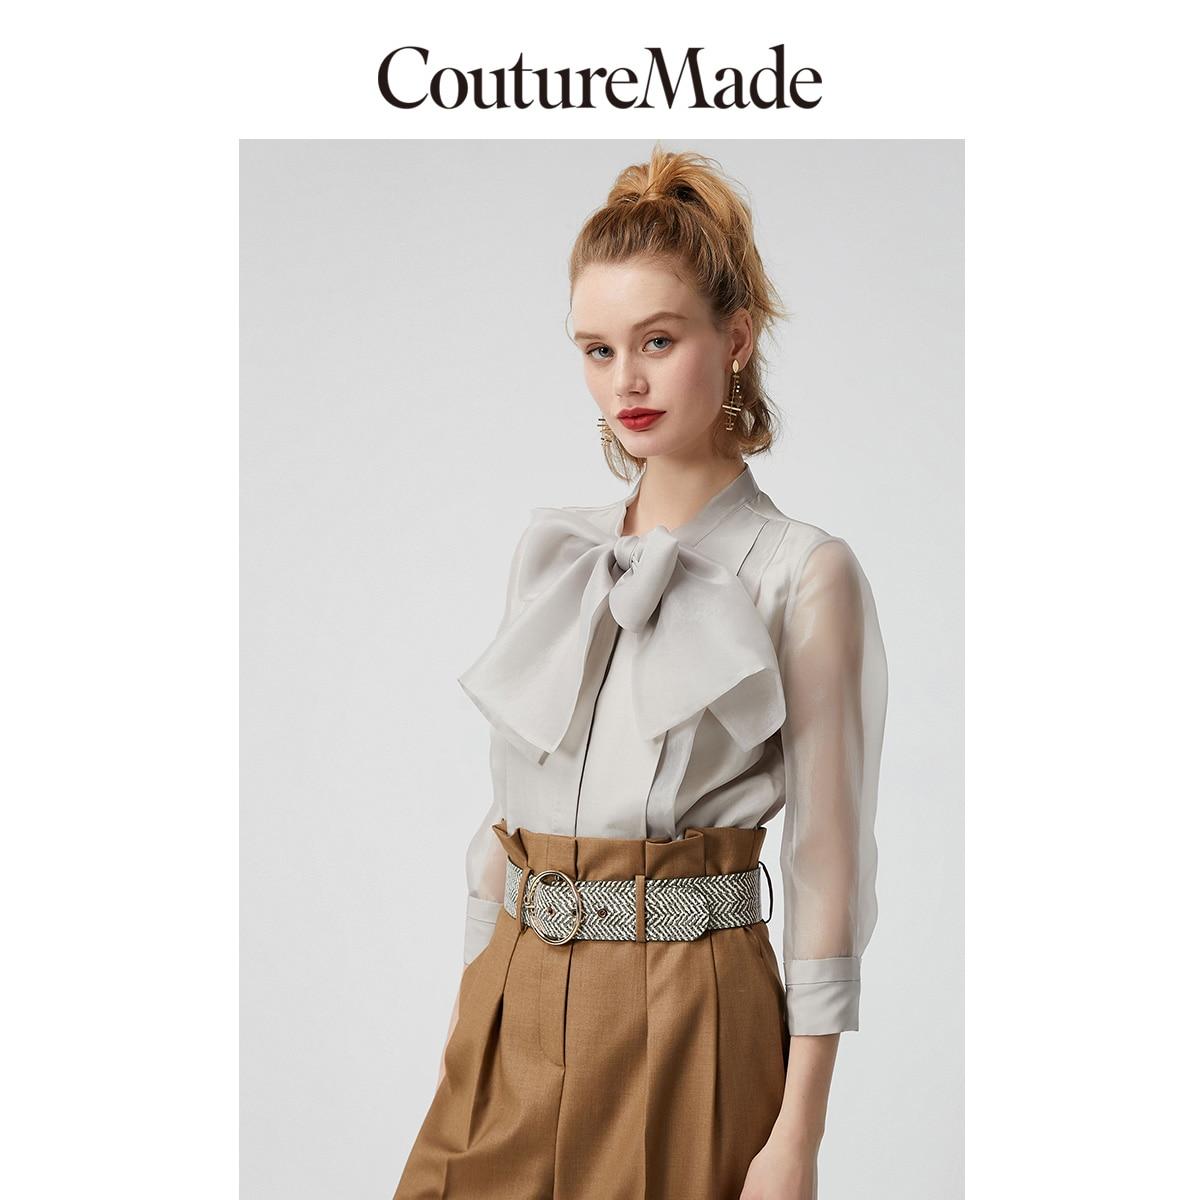 Vero Moda ContureMada Women's 44% Mulberry Silk Bowknot Neckline Spliced Shirt | 320131539